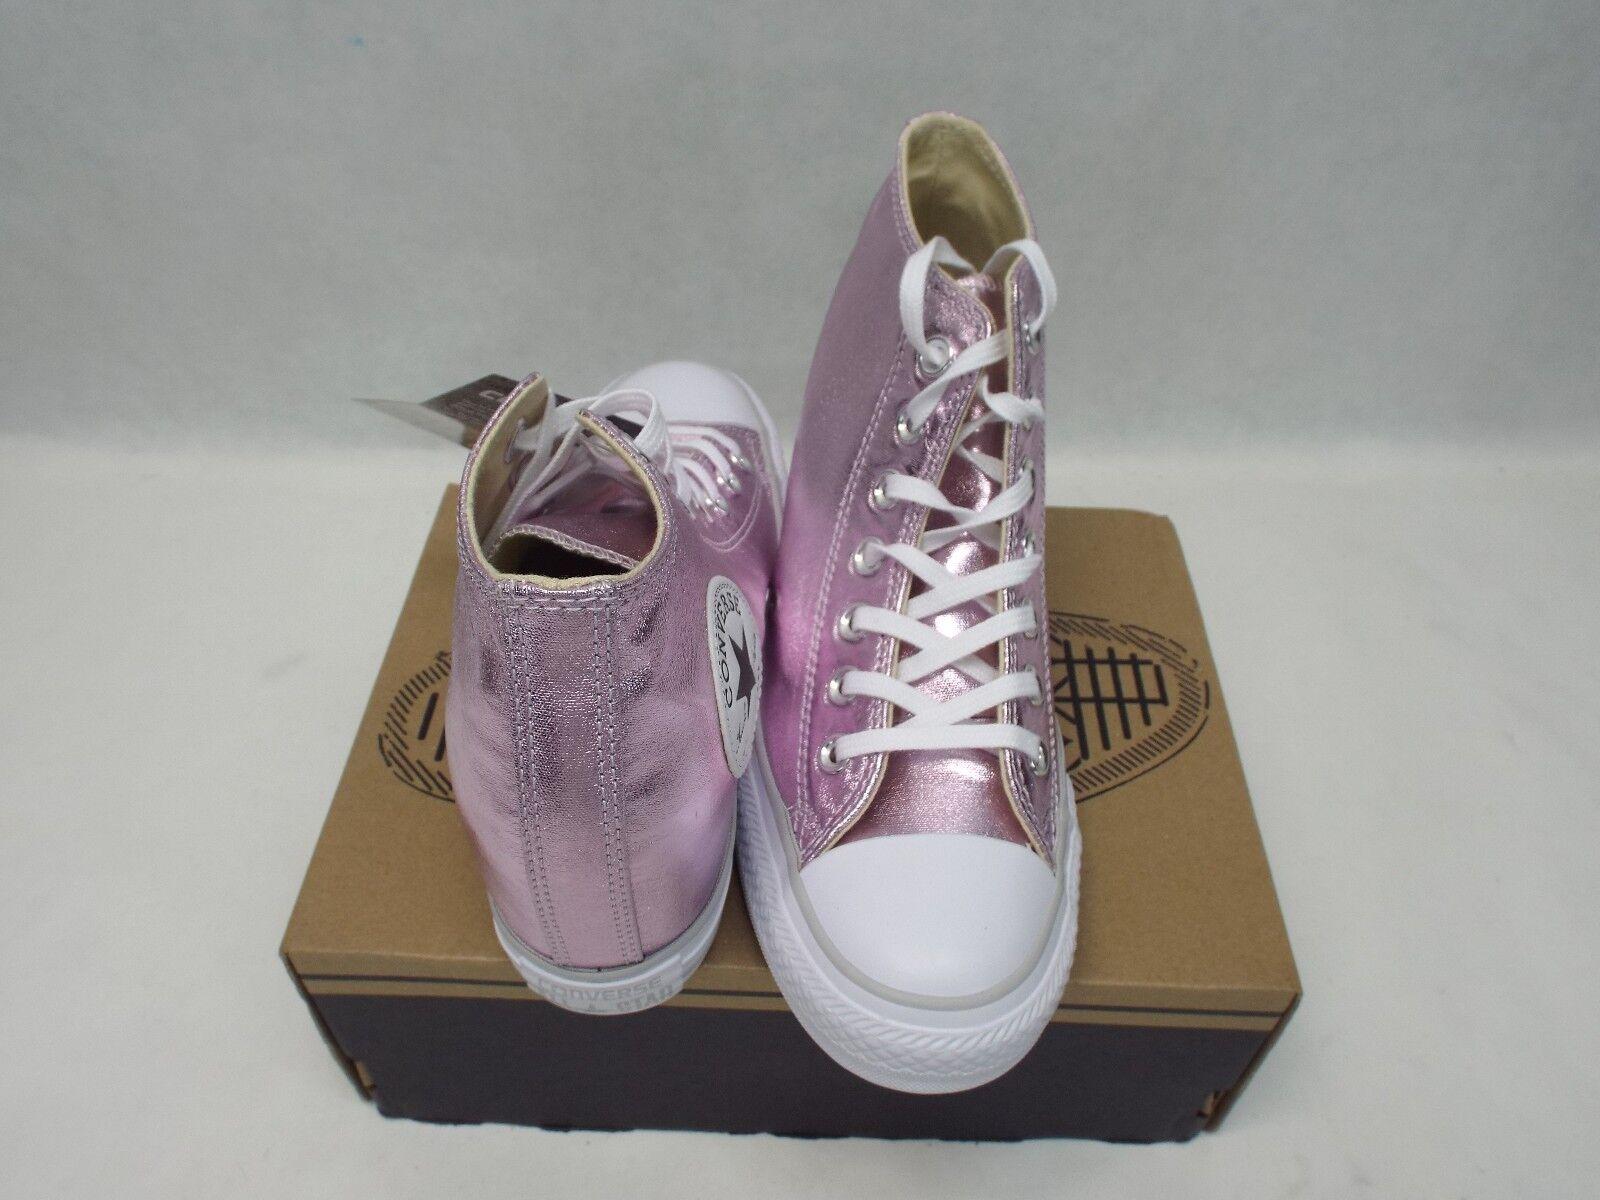 New Damenschuhe 10.5 CTAS Converse CTAS 10.5 Lux Mid Wedge Metallic Fuschia Schuhes 70 556779C fadede